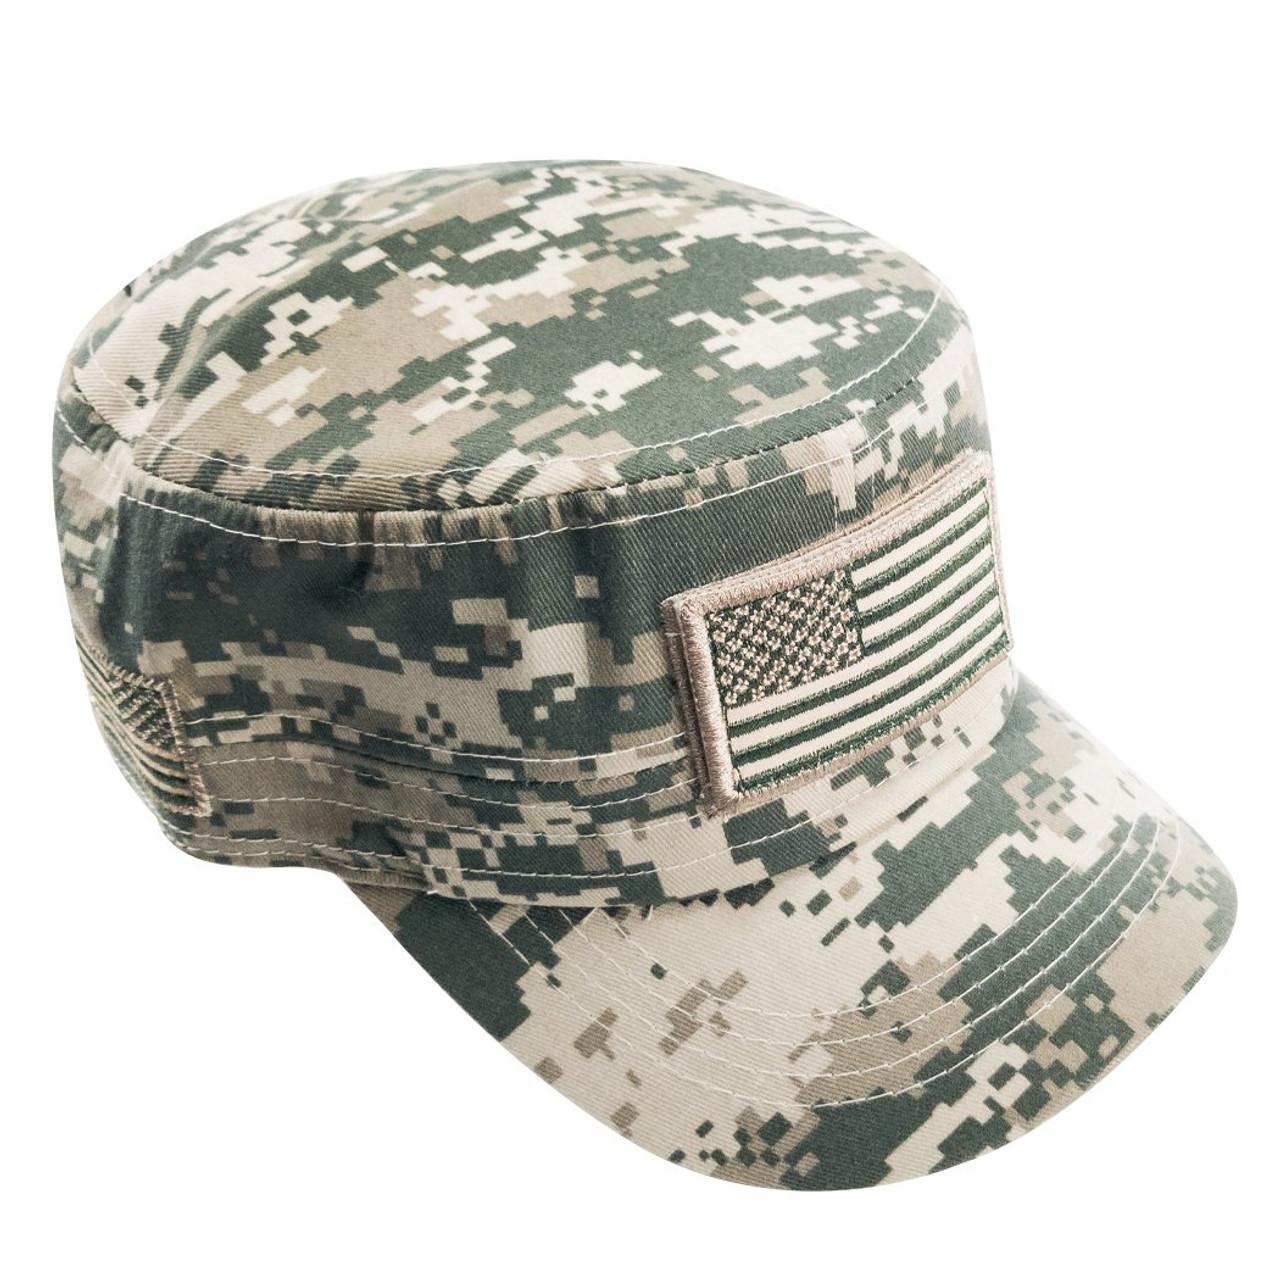 Army Metal Novelty Sign American USA Military Digital Camo United States U.S